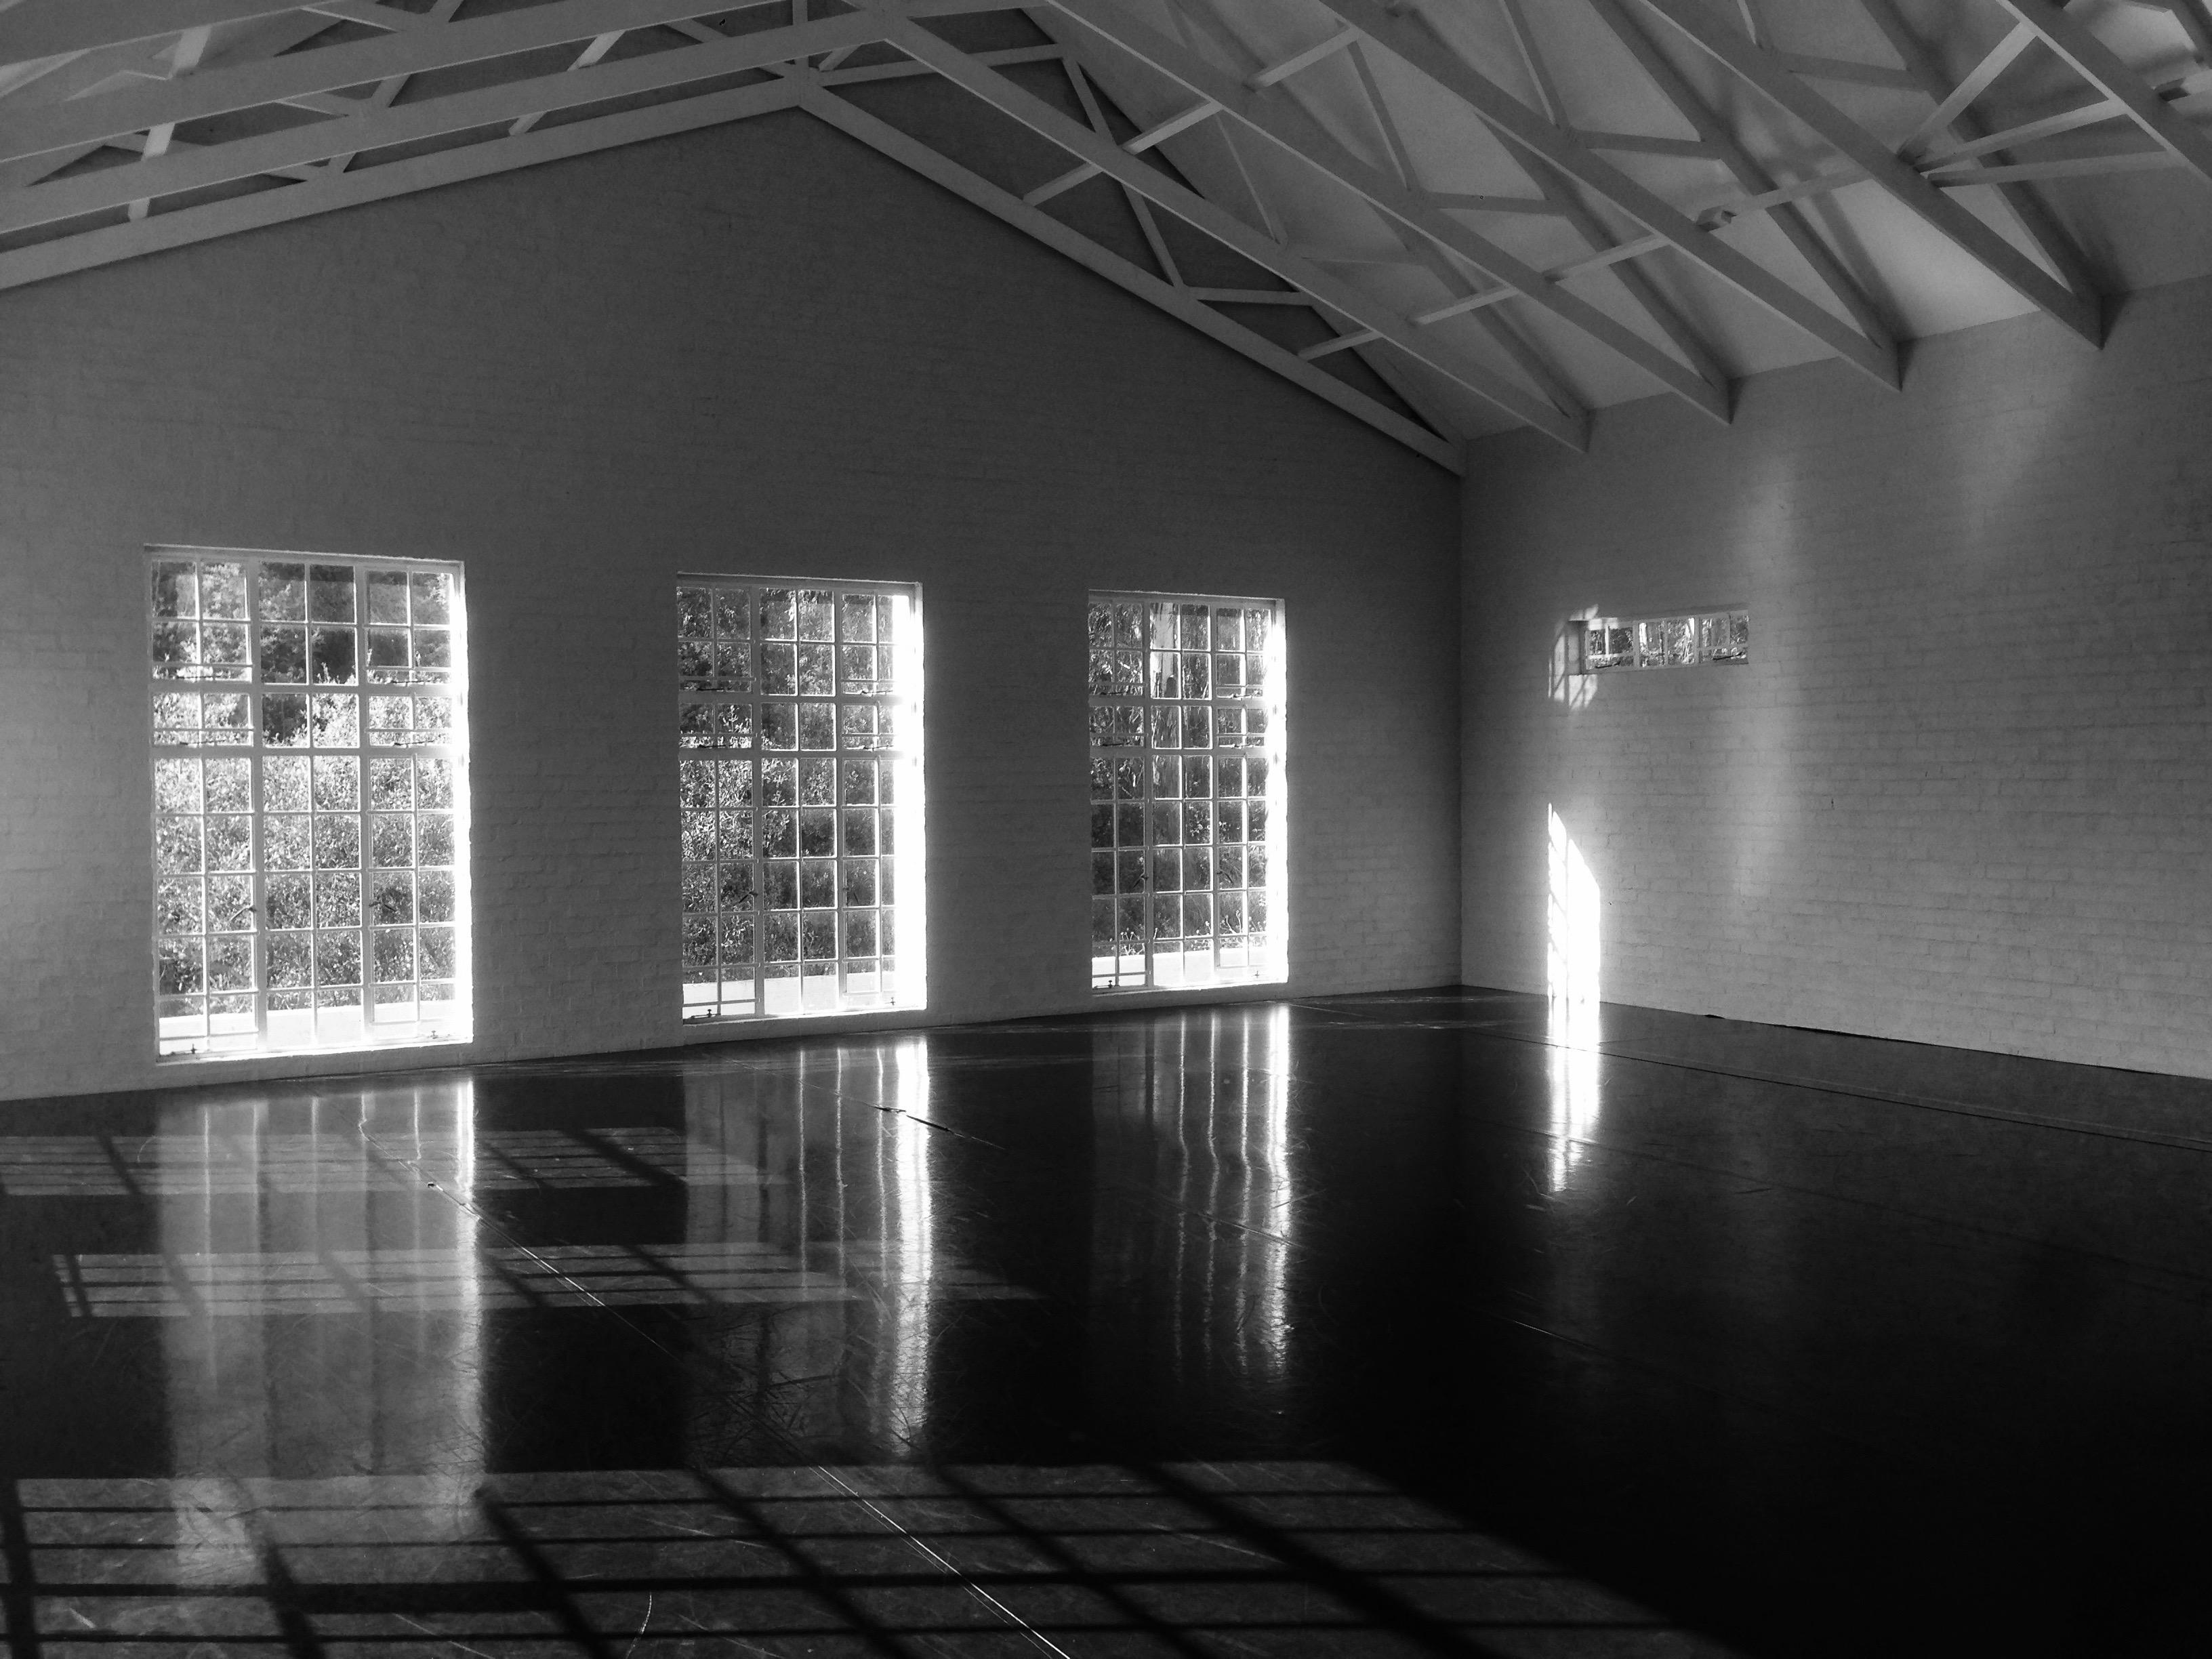 Dance studio